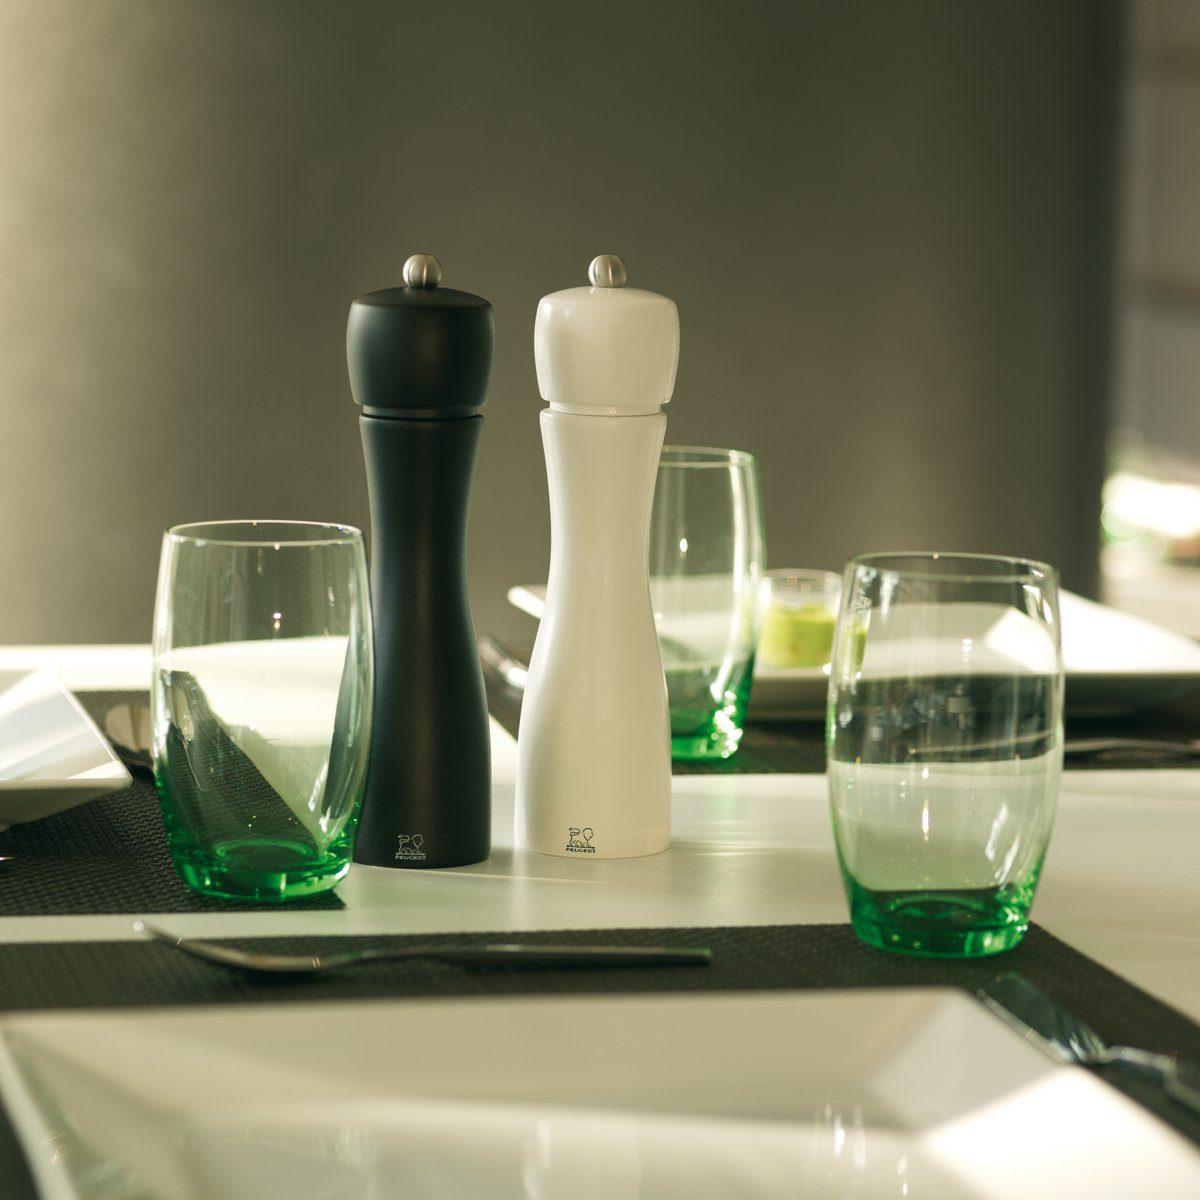 PEUGEOT Peugeot Salz- und Pfeffermühle TAHITI DUO schwarz-weiß 20cm